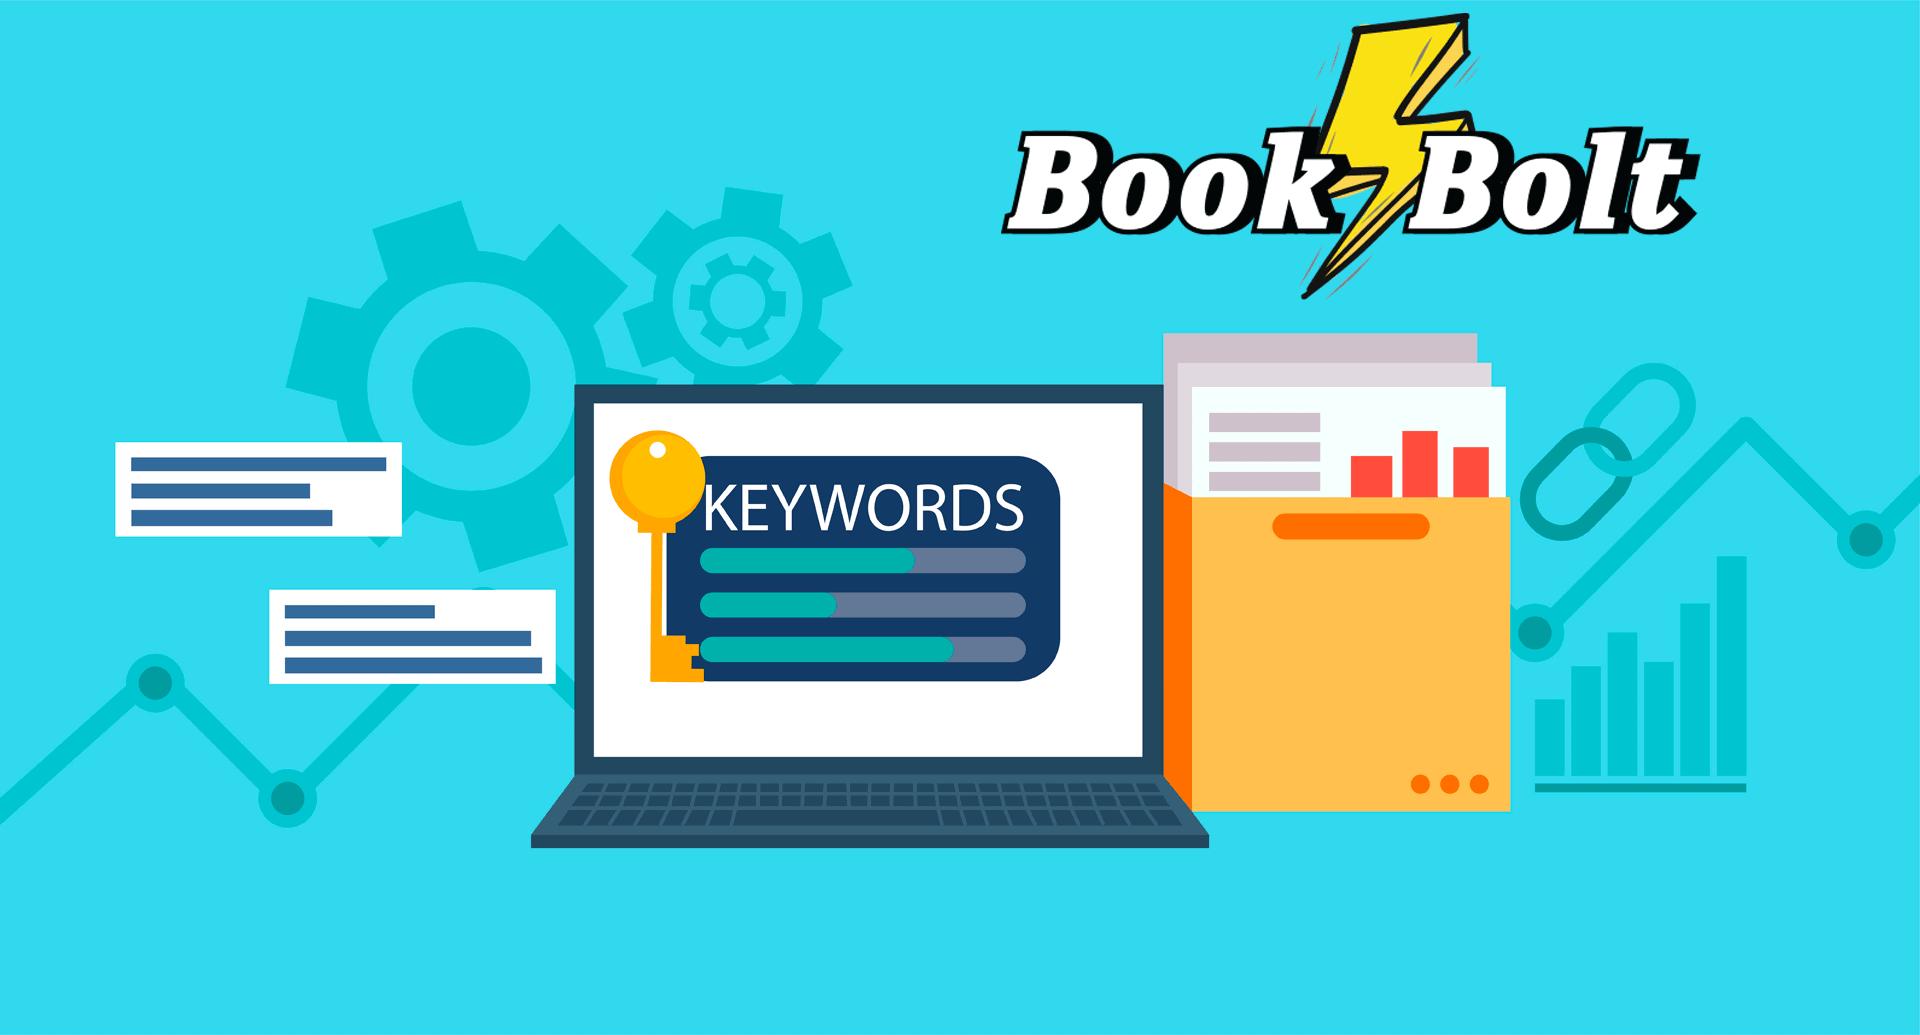 Book Bolt Keywords